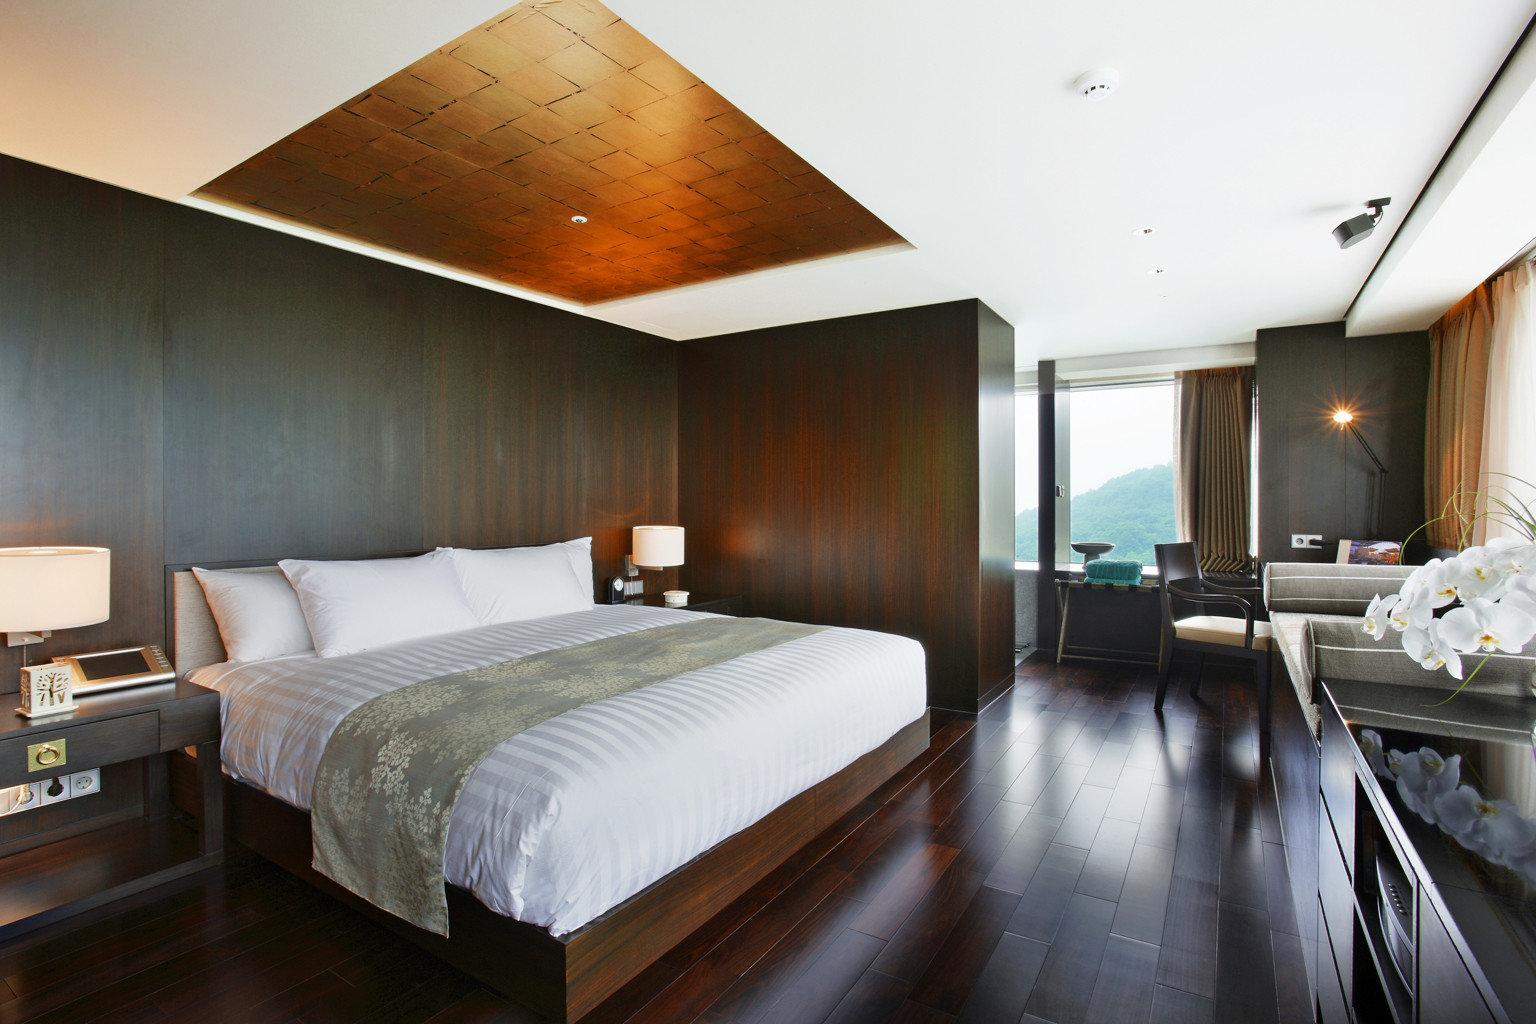 Bedroom Luxury Modern Scenic views Suite property yacht passenger ship